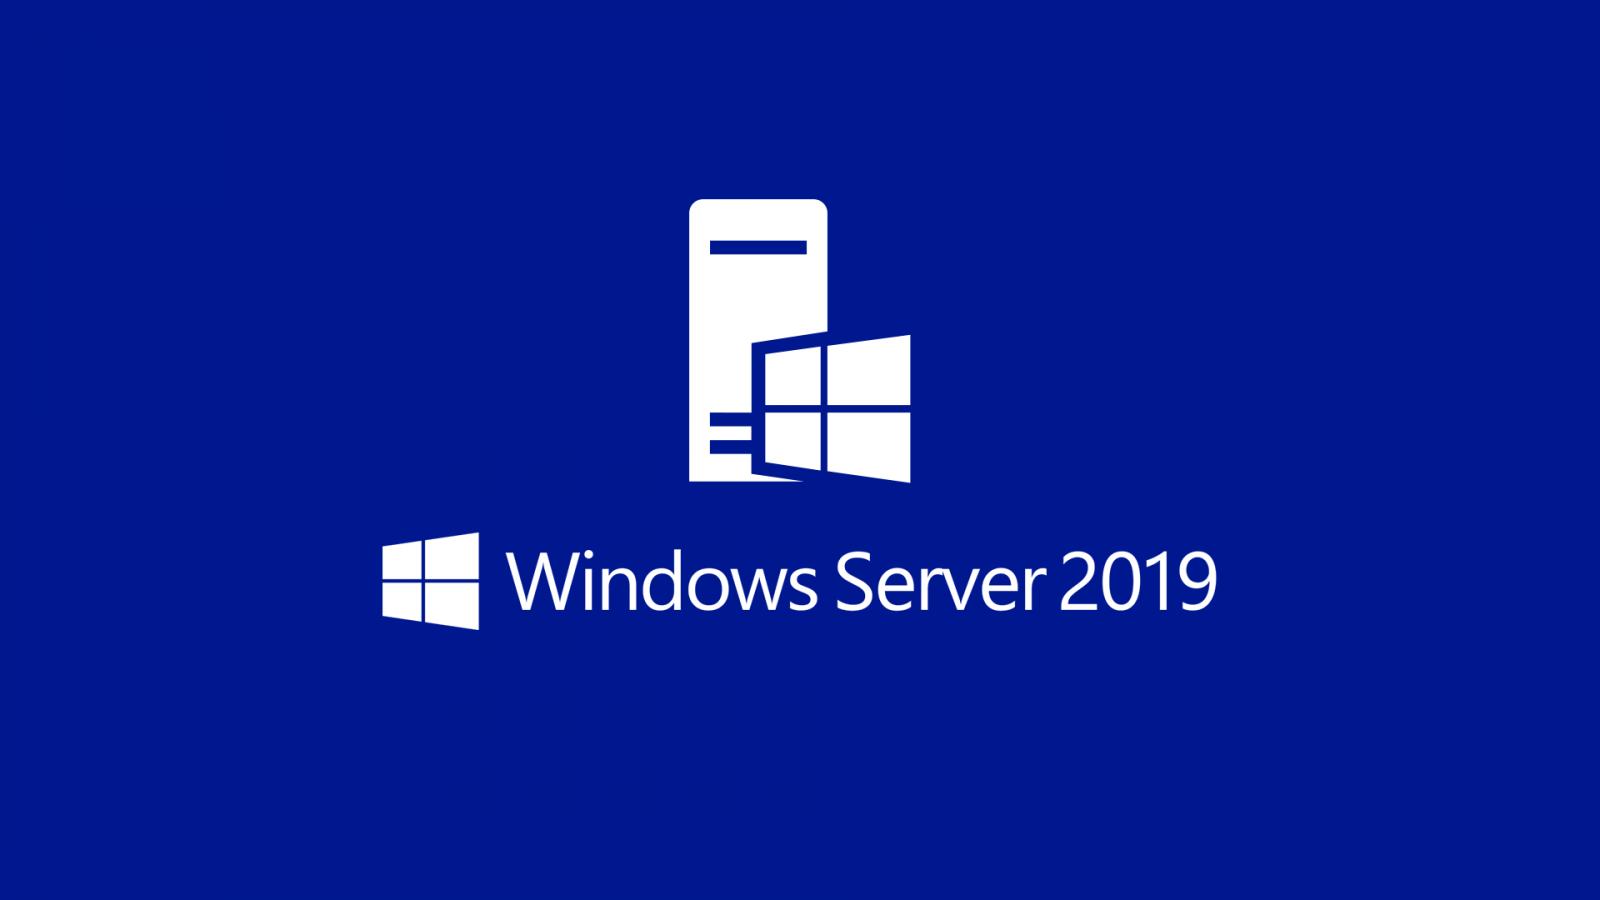 Установка Windows Server 2019 на VirtualBox